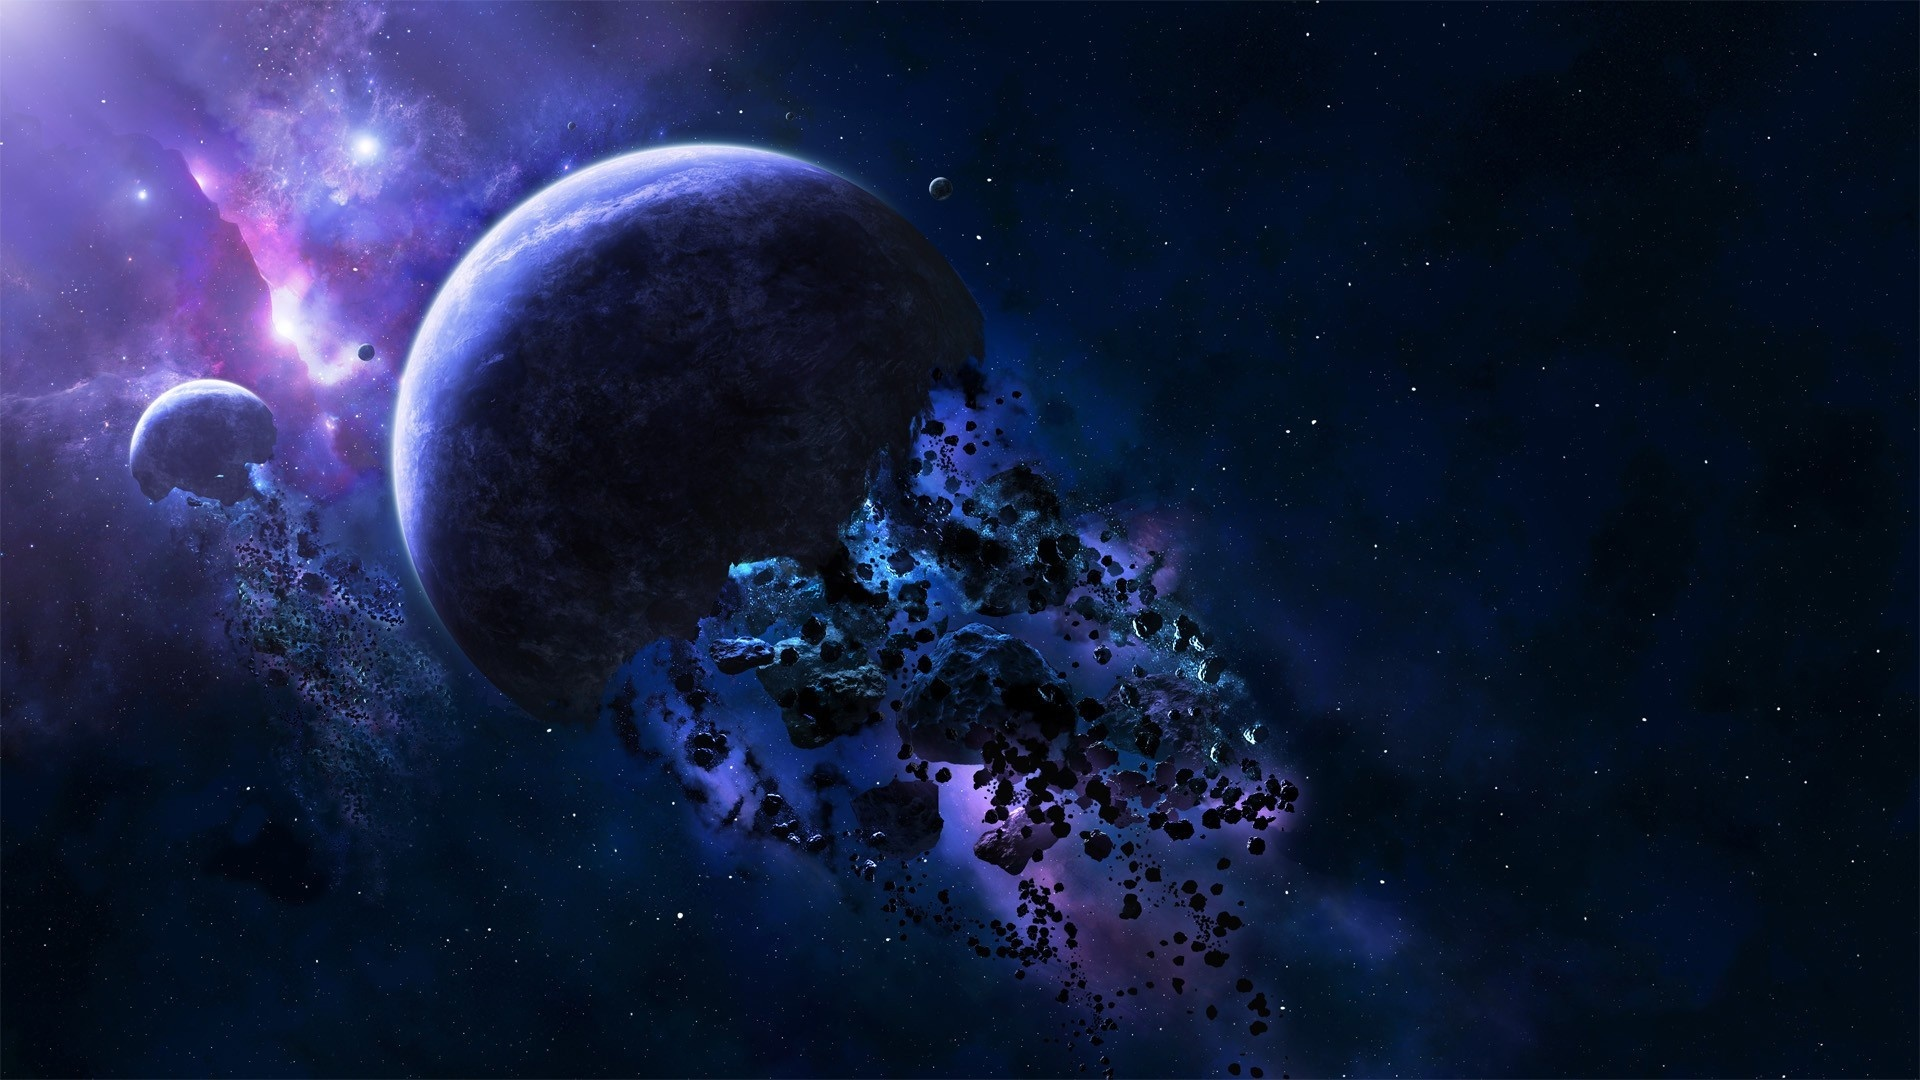 Wallpaper Planet Debris Asteroids Blue Space 1920x1080 Full Hd 2k